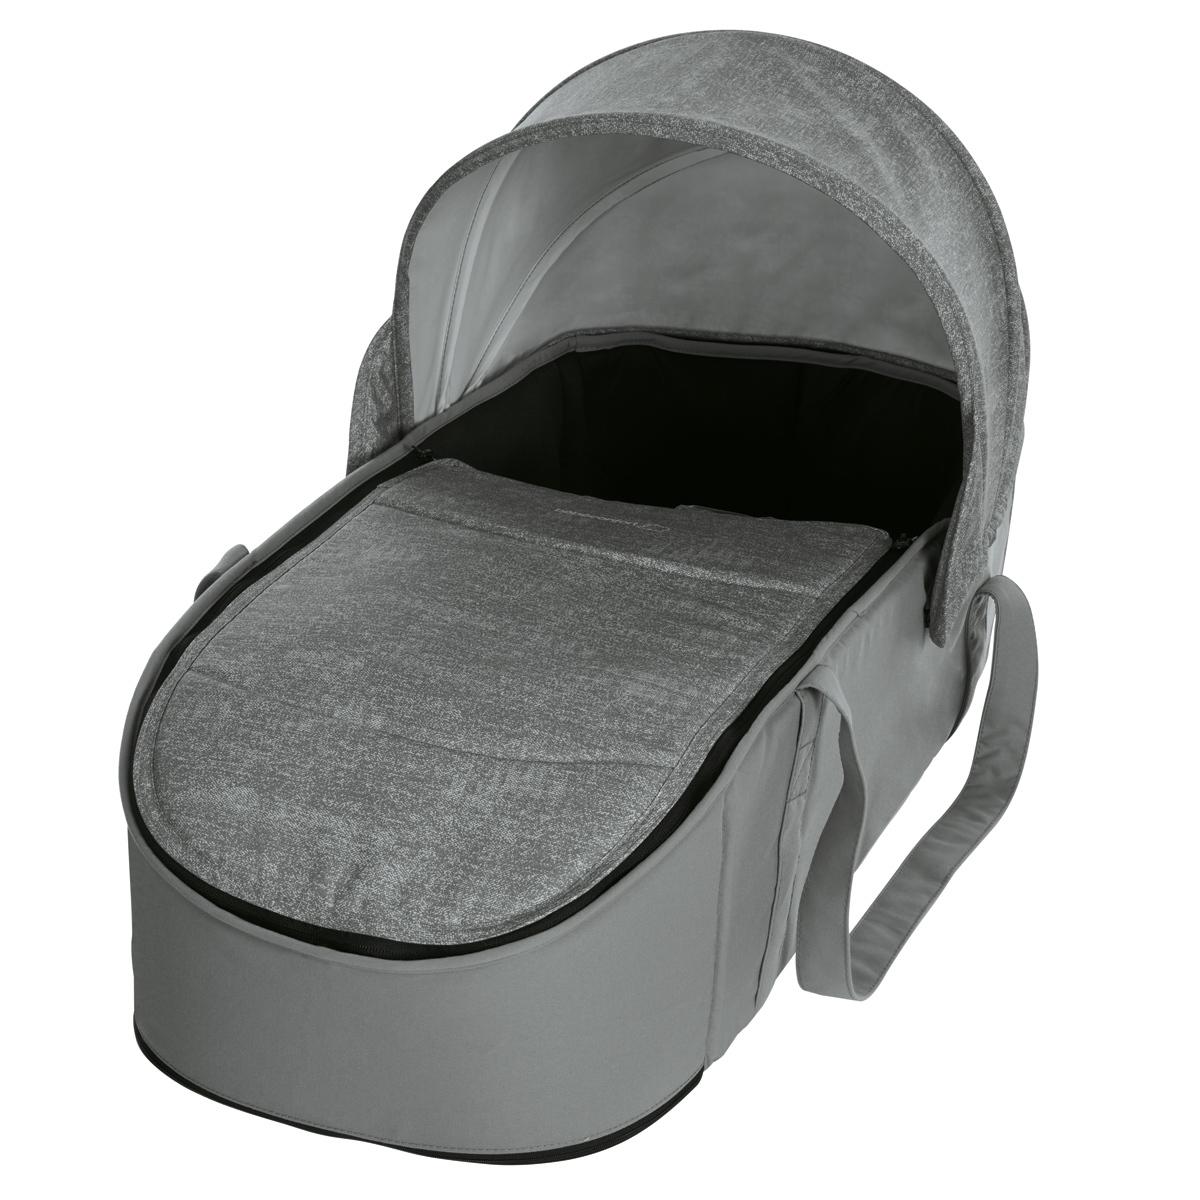 Nacelle Nacelle Laïka - Nomad Grey Nacelle Laïka - Nomad Grey